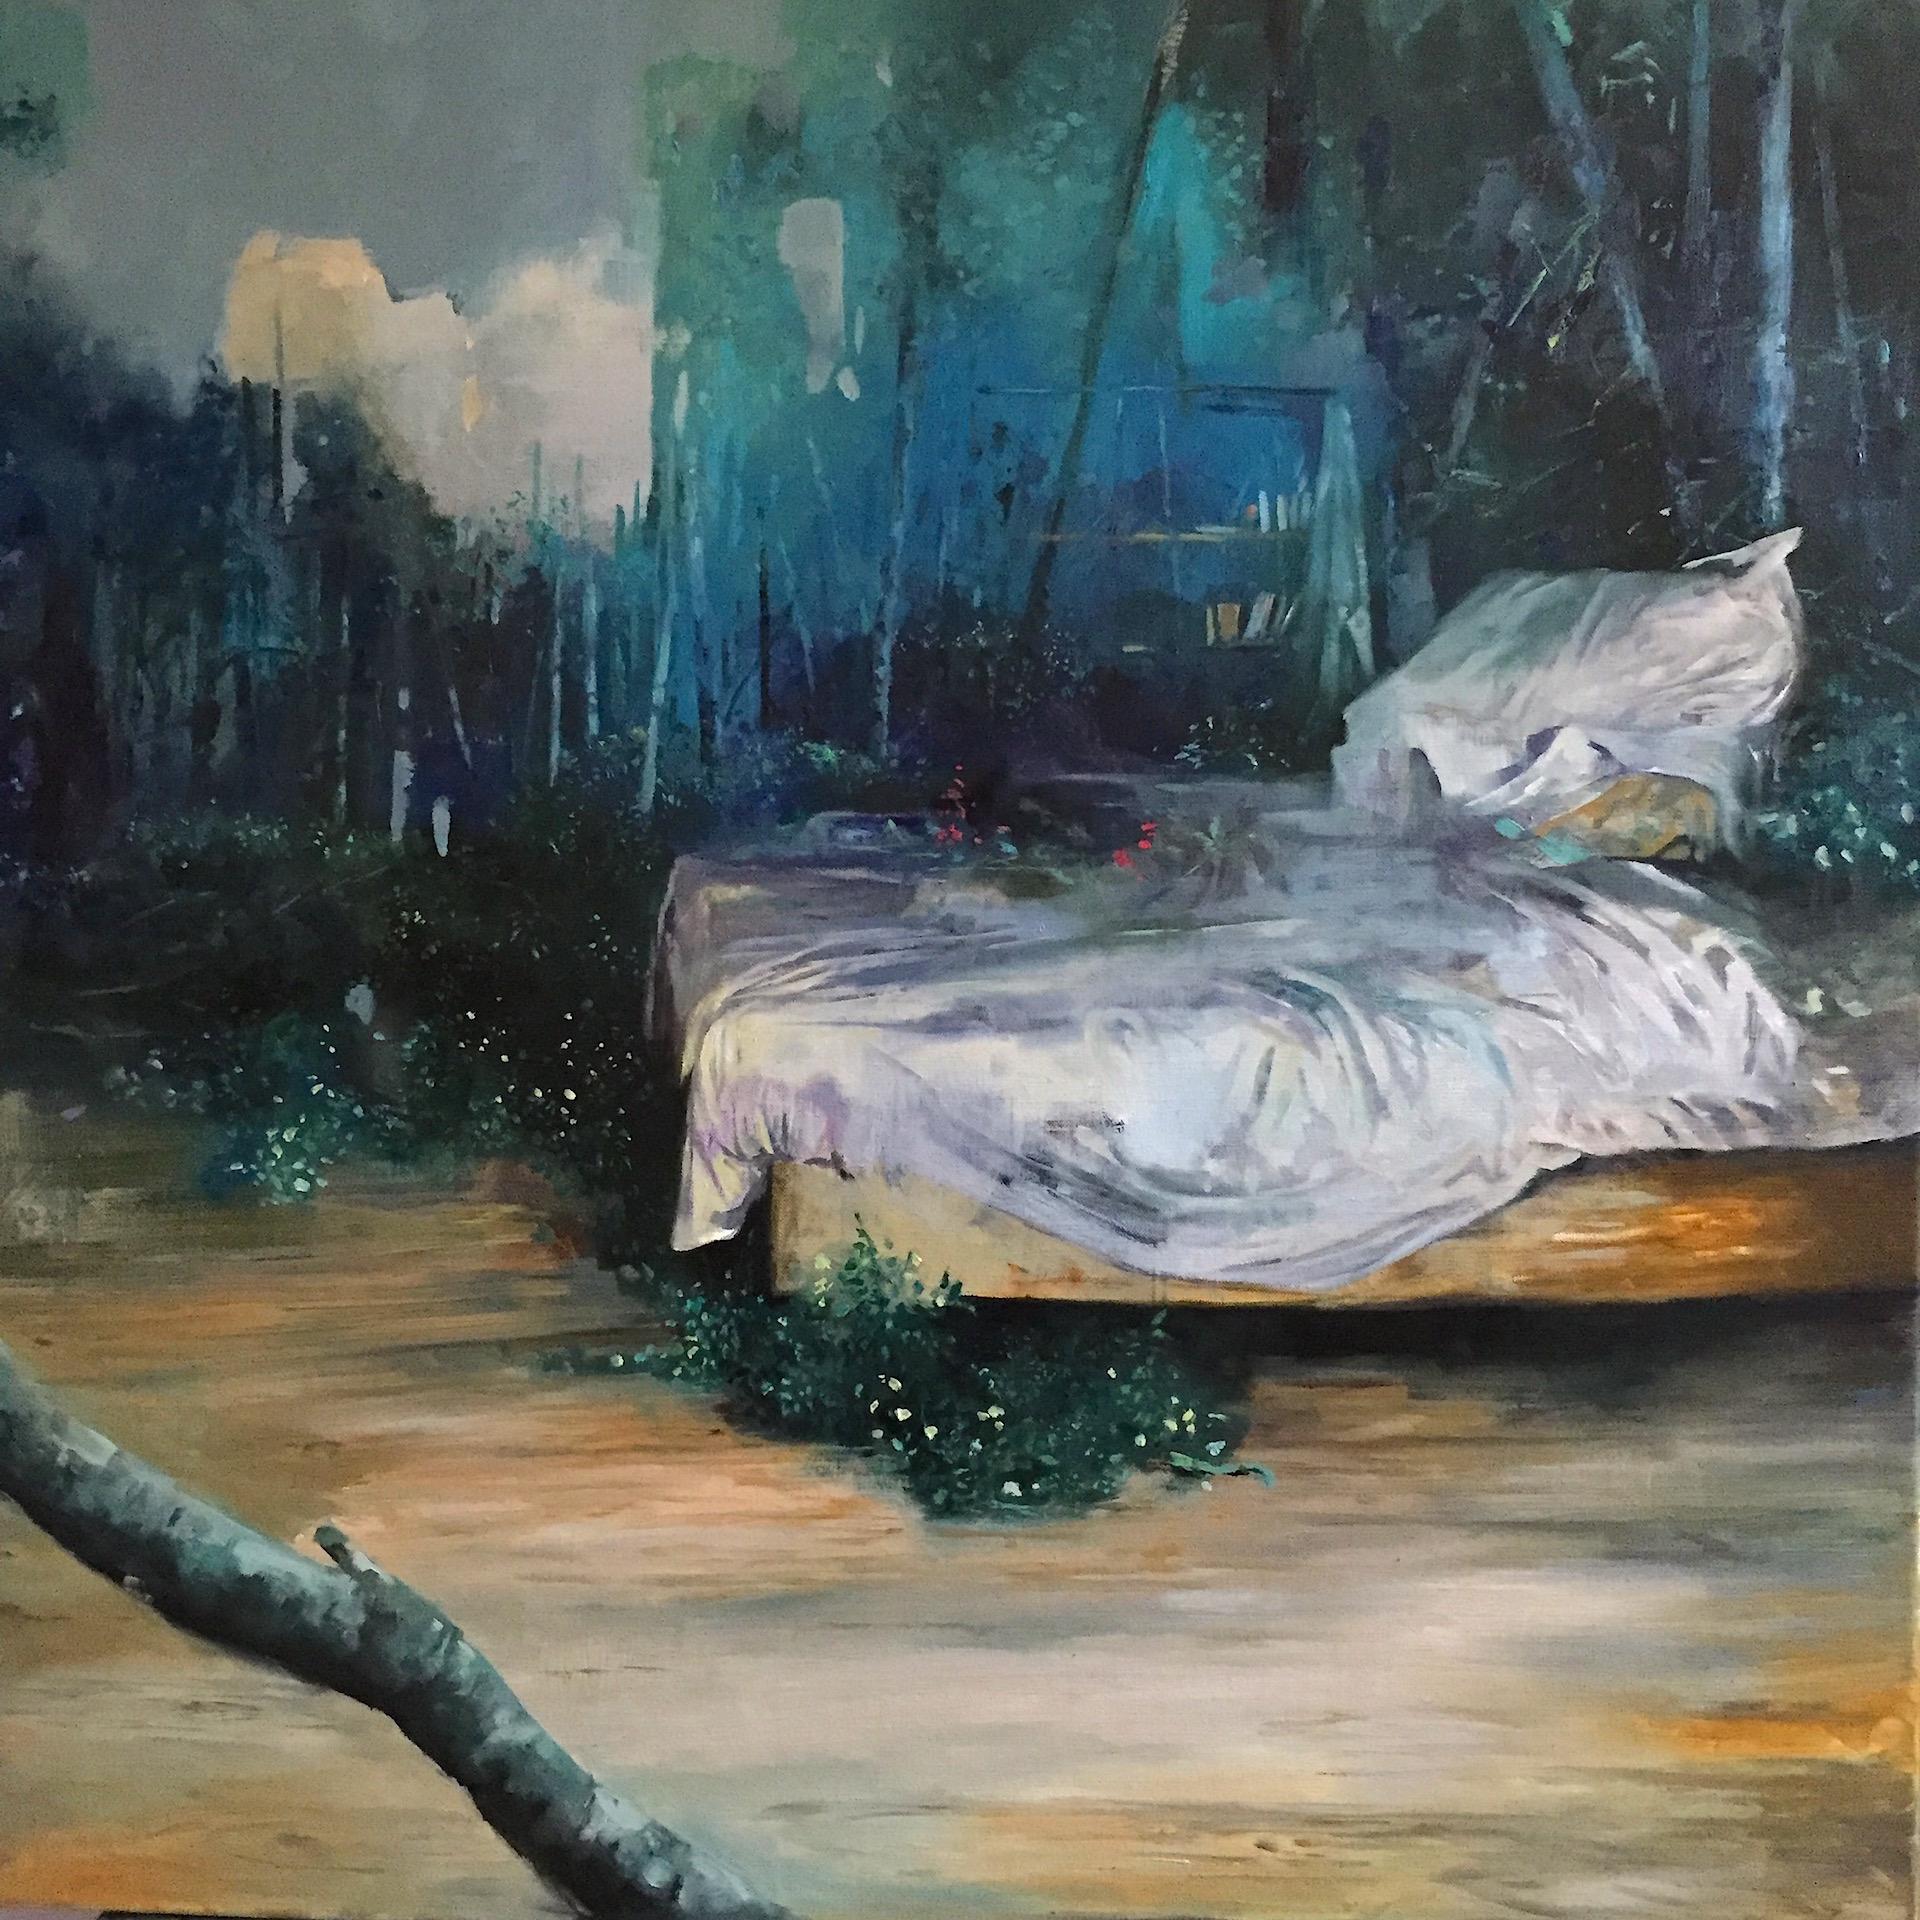 Insomnia_2016_Oil_on_canvas_80X80.JPG